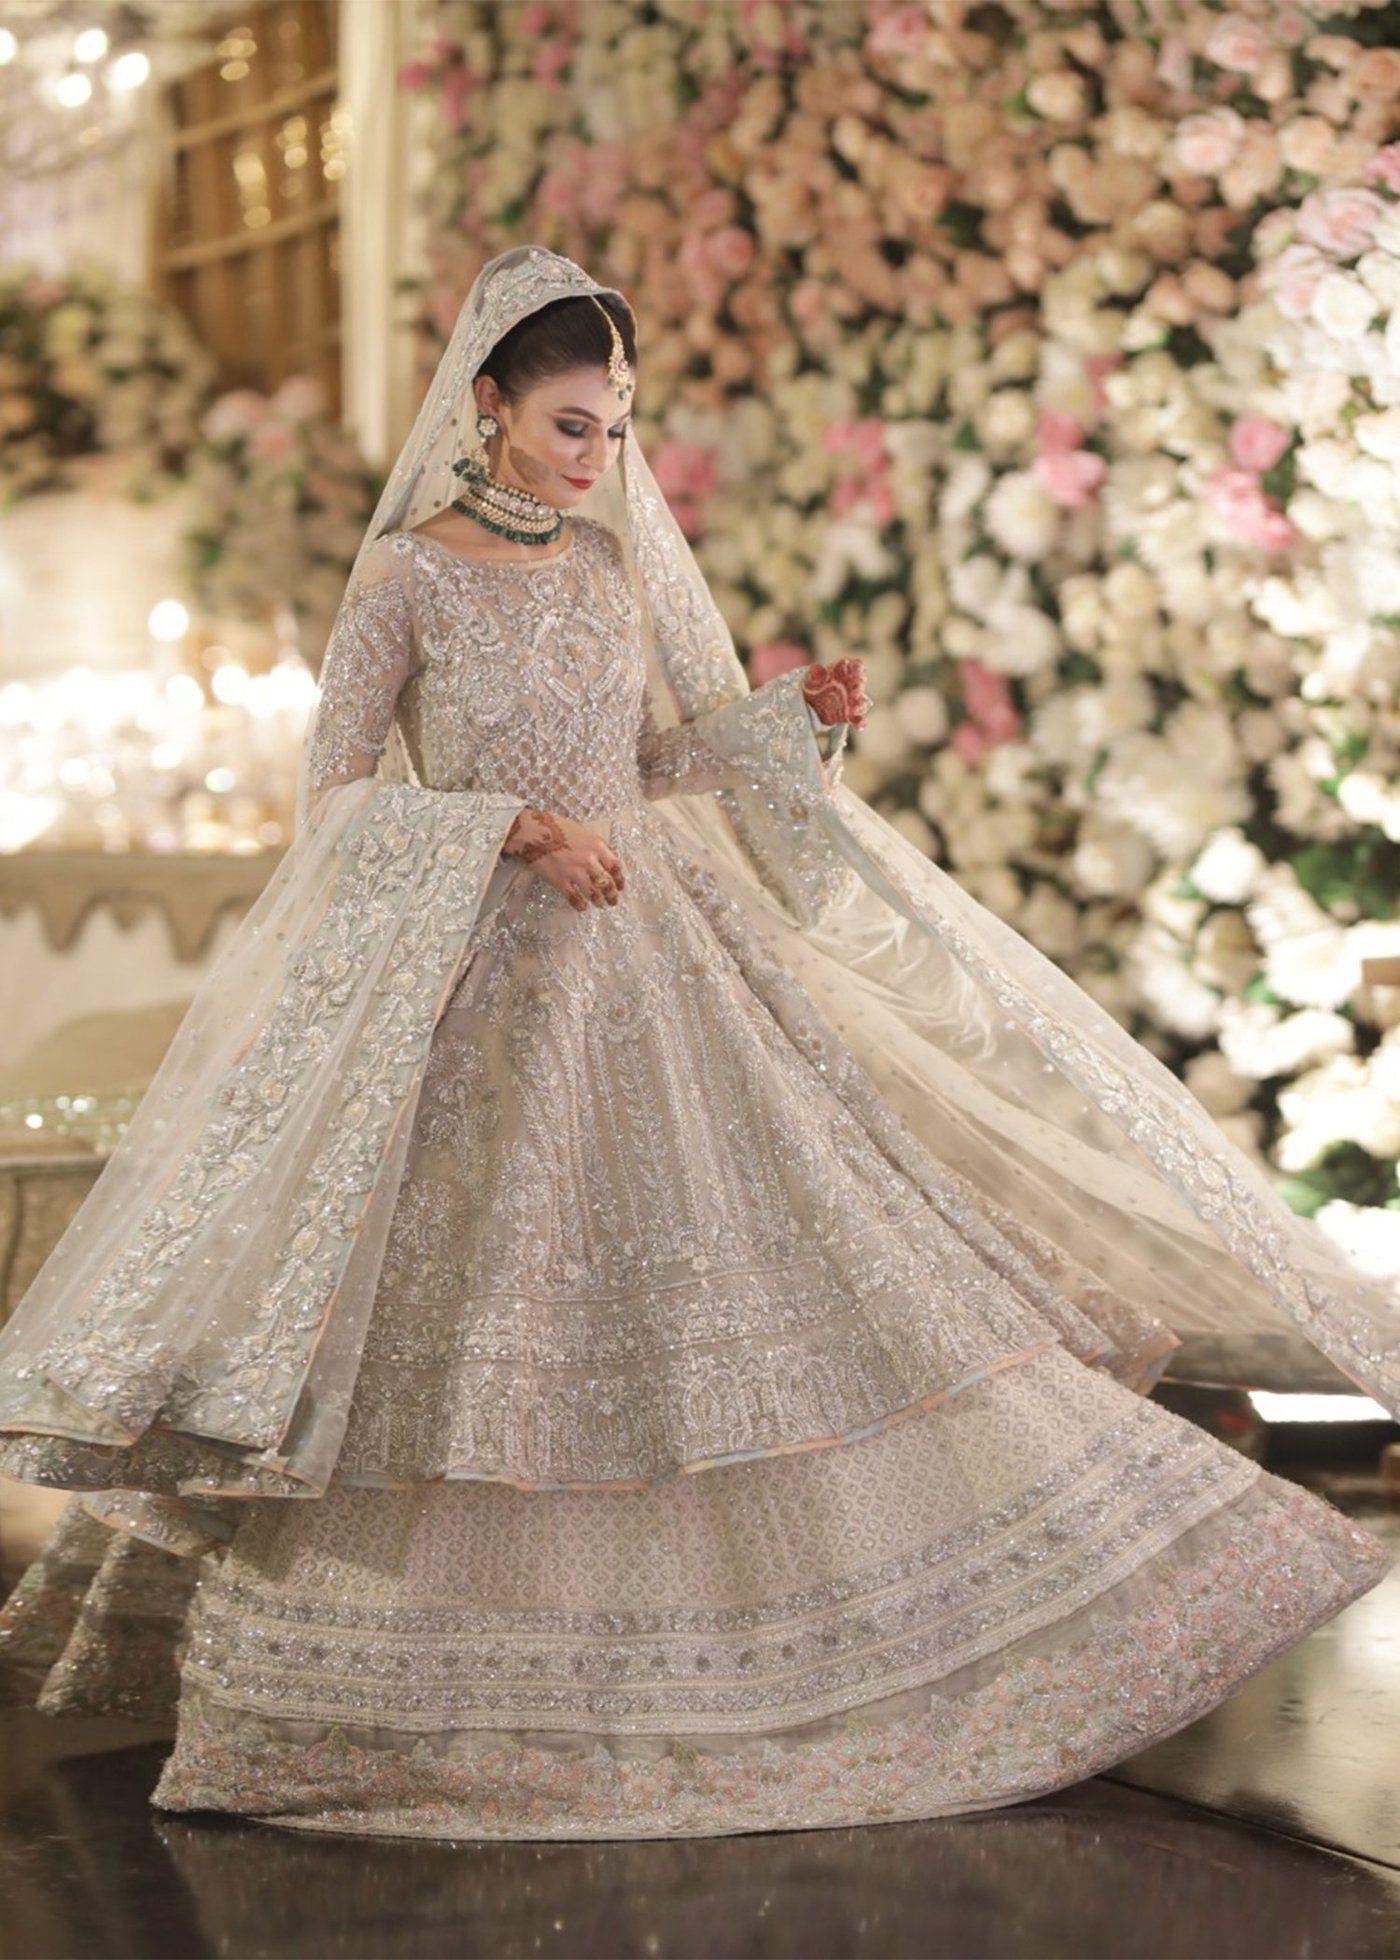 15 Most Trending Bridal Lehenga Designs Of 2020 Di 2020 Gaun Perkawinan Pakaian Pernikahan Pengantin India